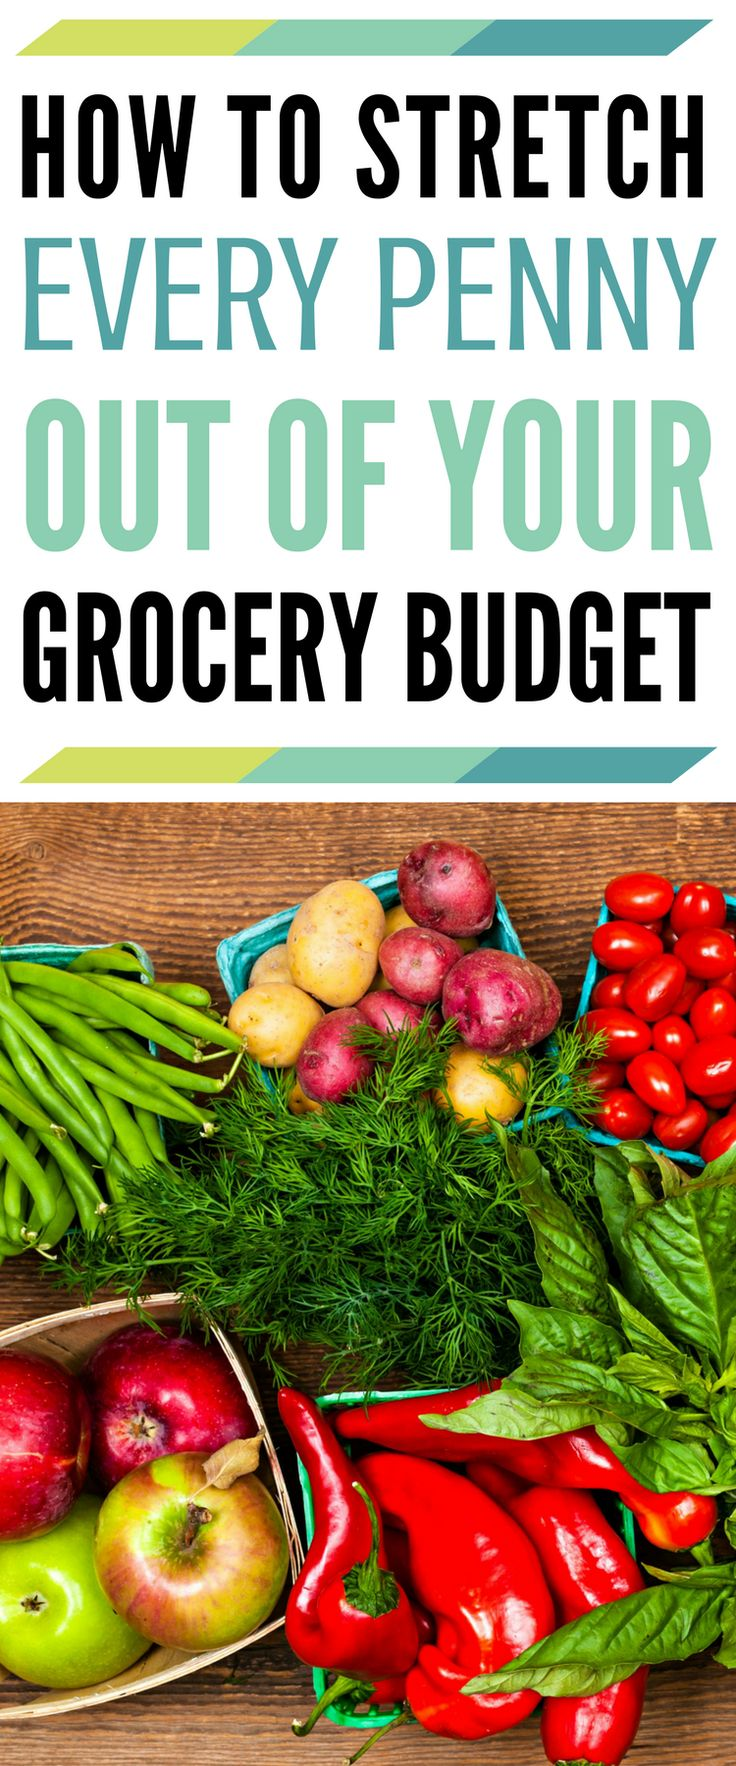 Stretch your budget